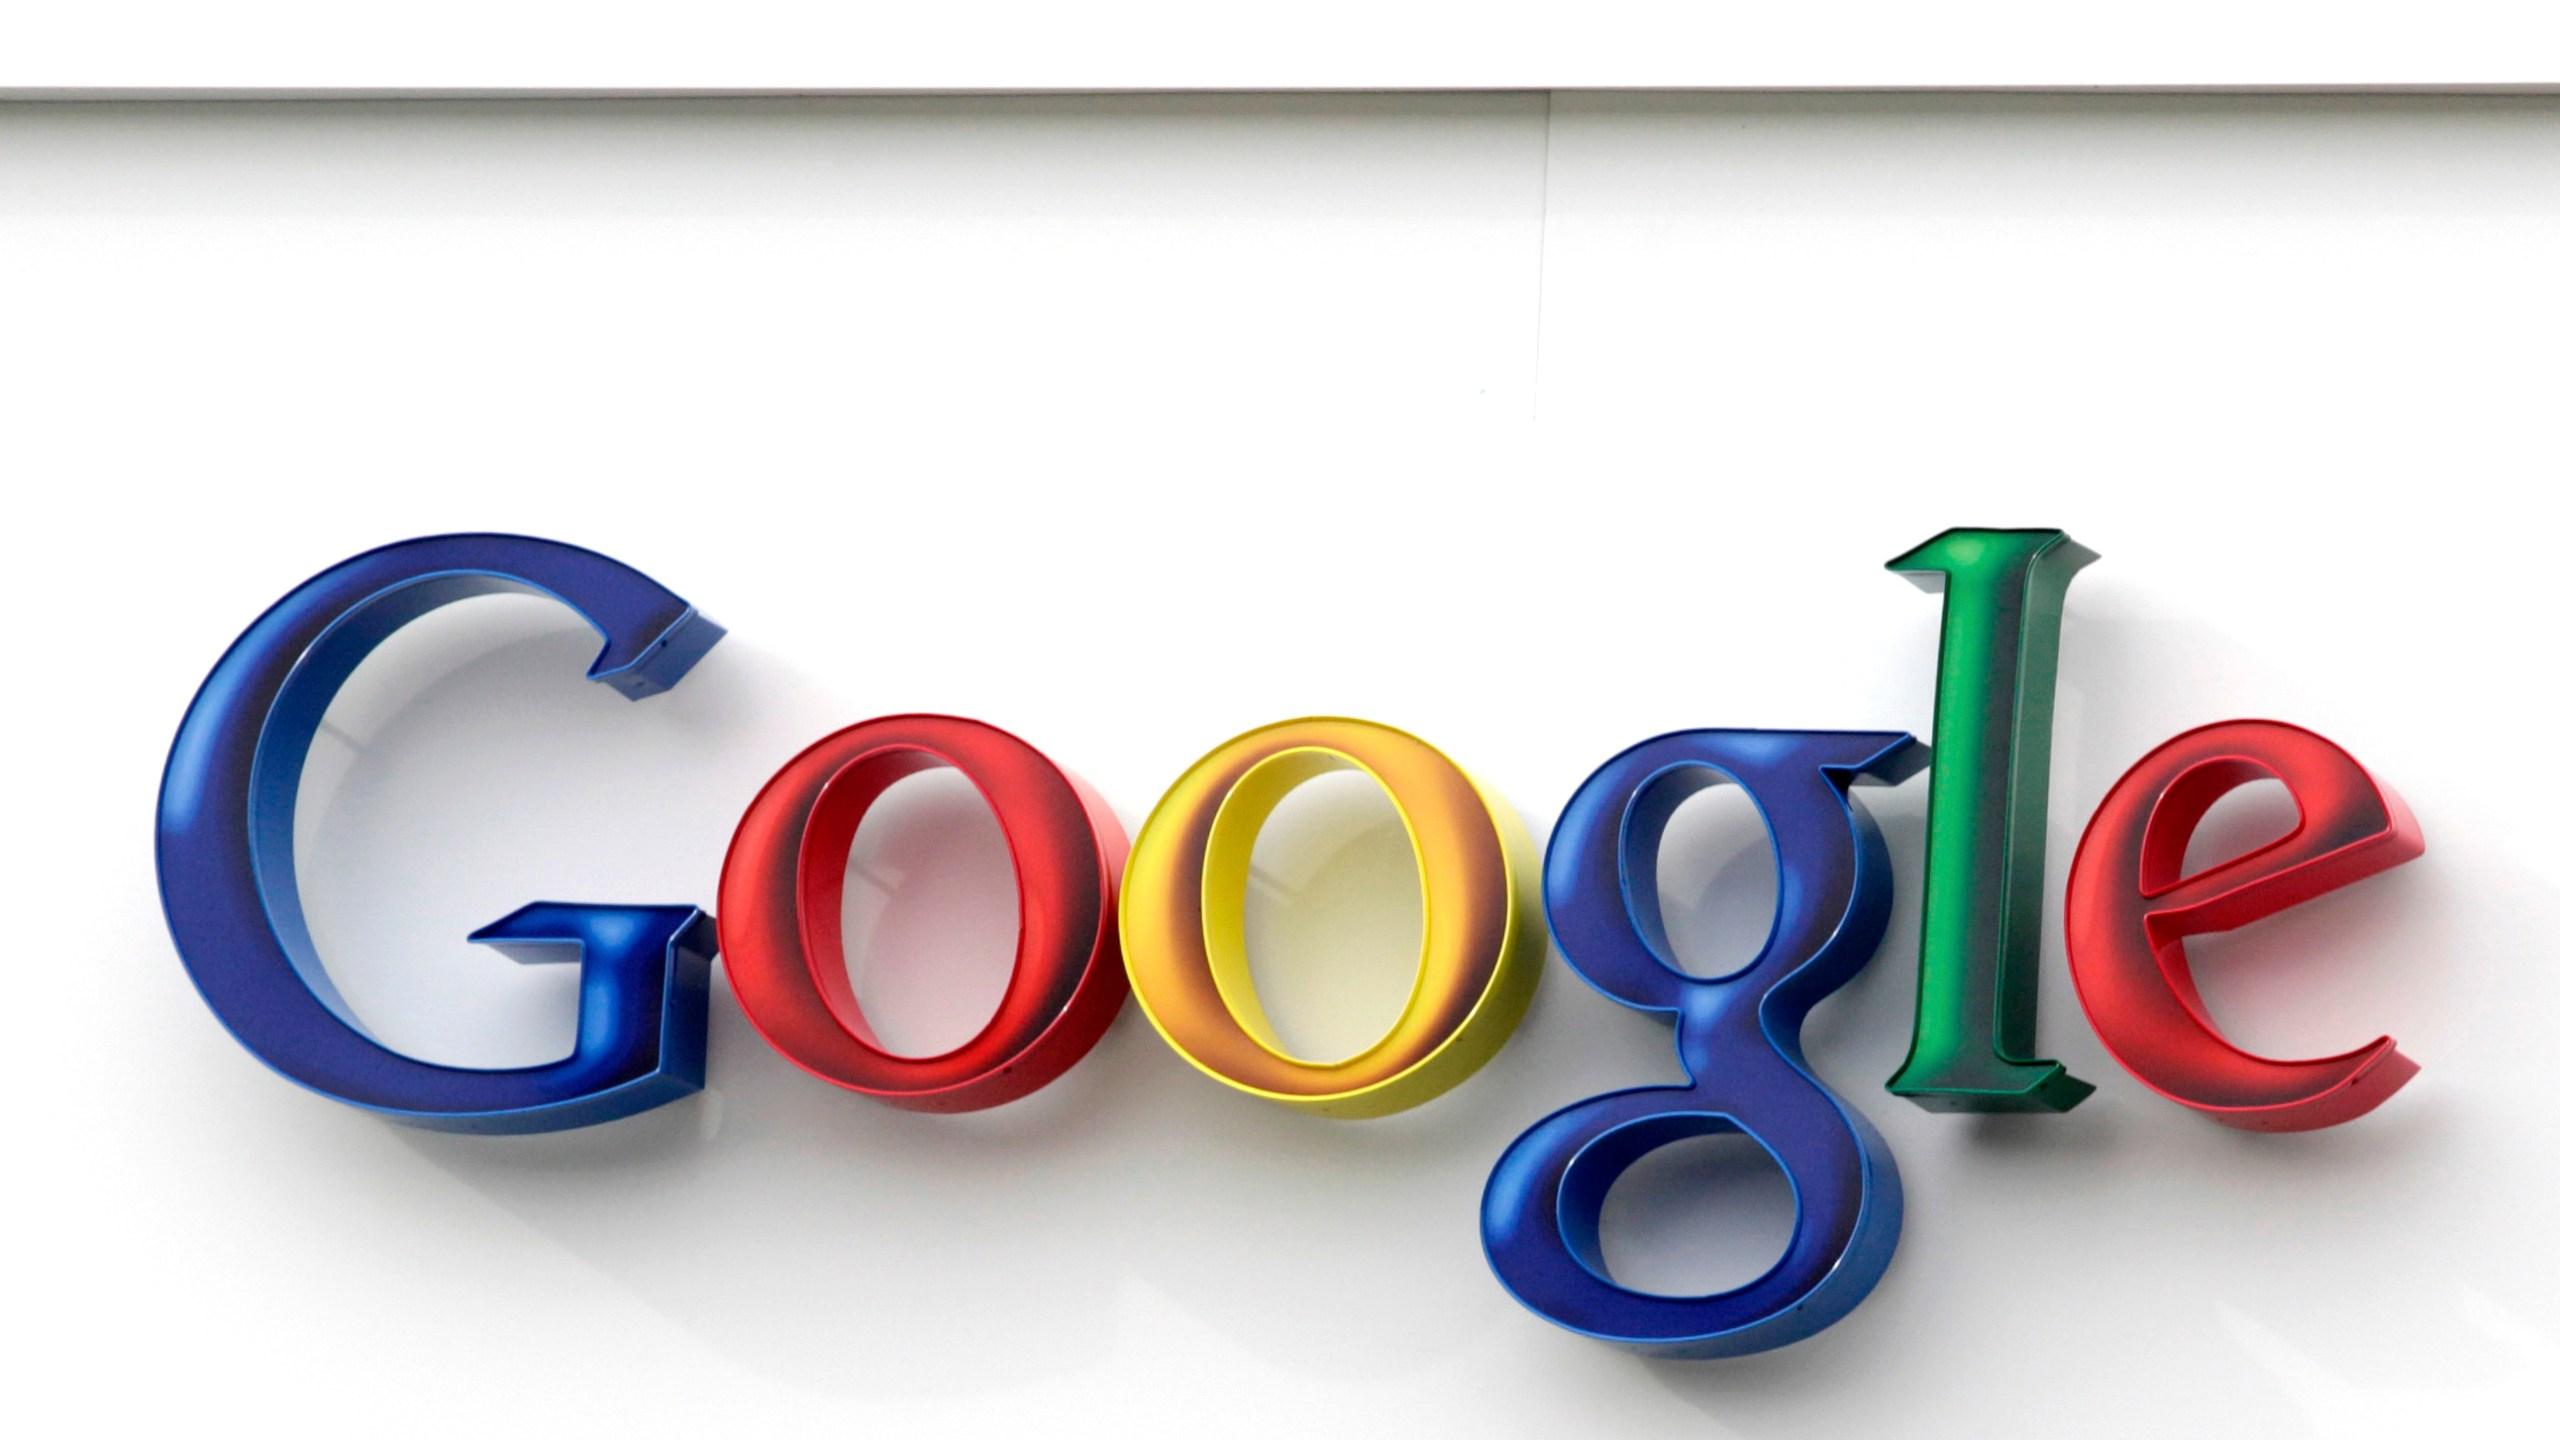 Google_Ads_99474-159532.jpg58434788